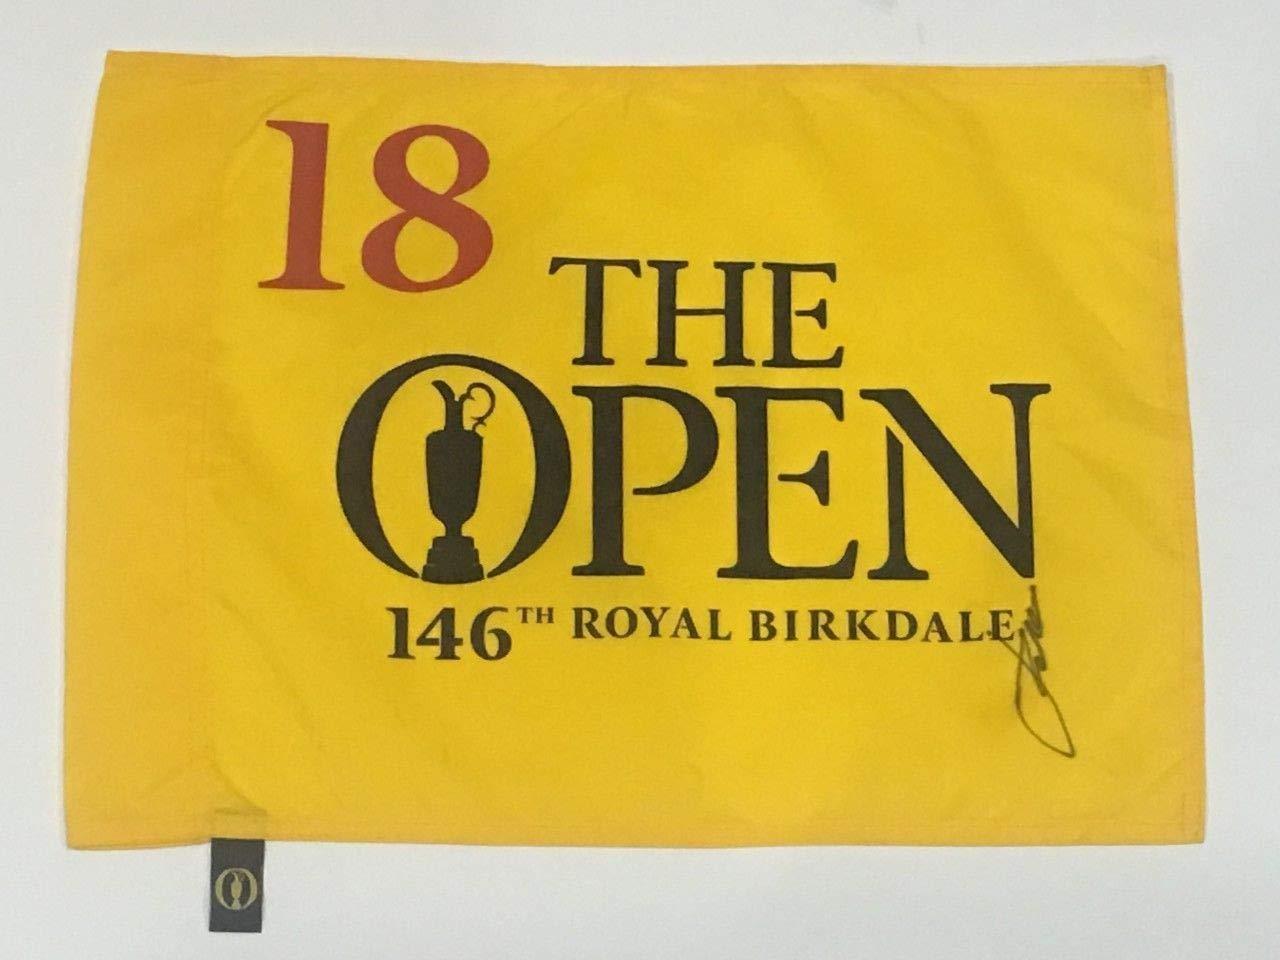 Jordan Spieth Autographed Signed 2017 British Open Flag Royal Birkdale Proof JSA Authentic